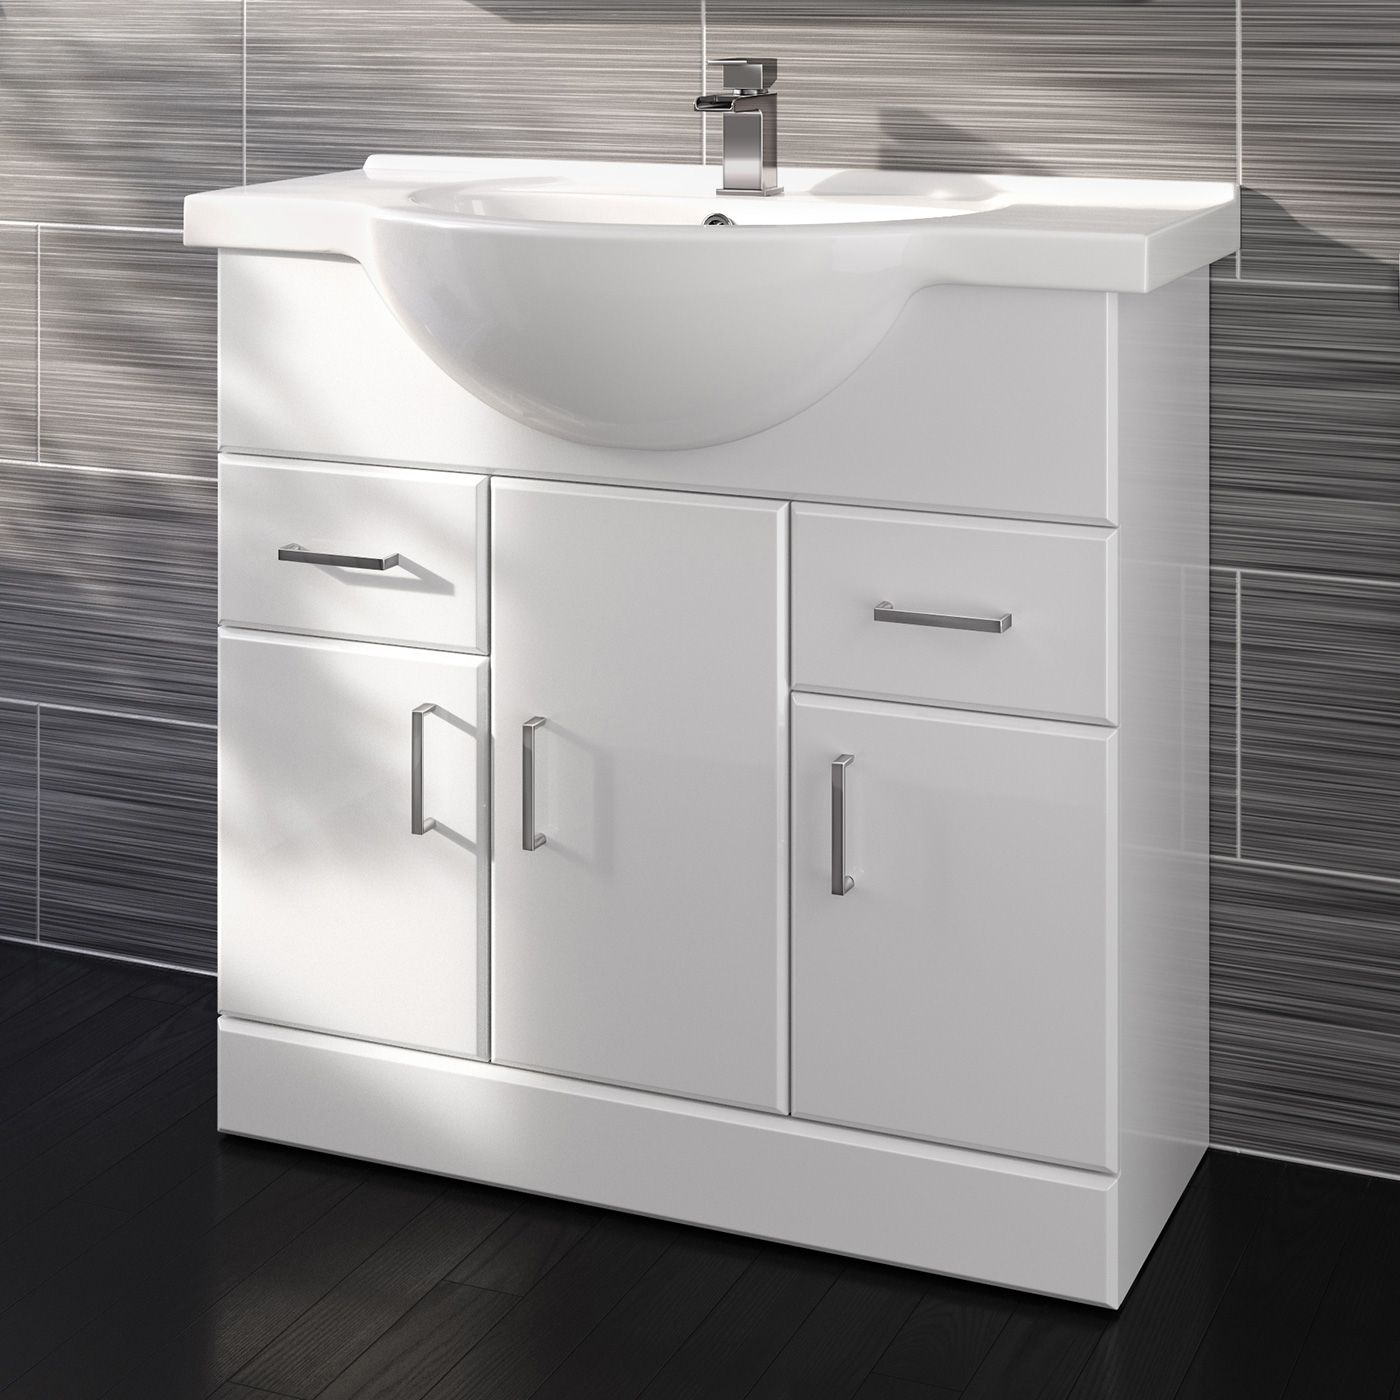 850x330mm Quartz Gloss White Built In Basin Unit | Basin unit, Basin ...